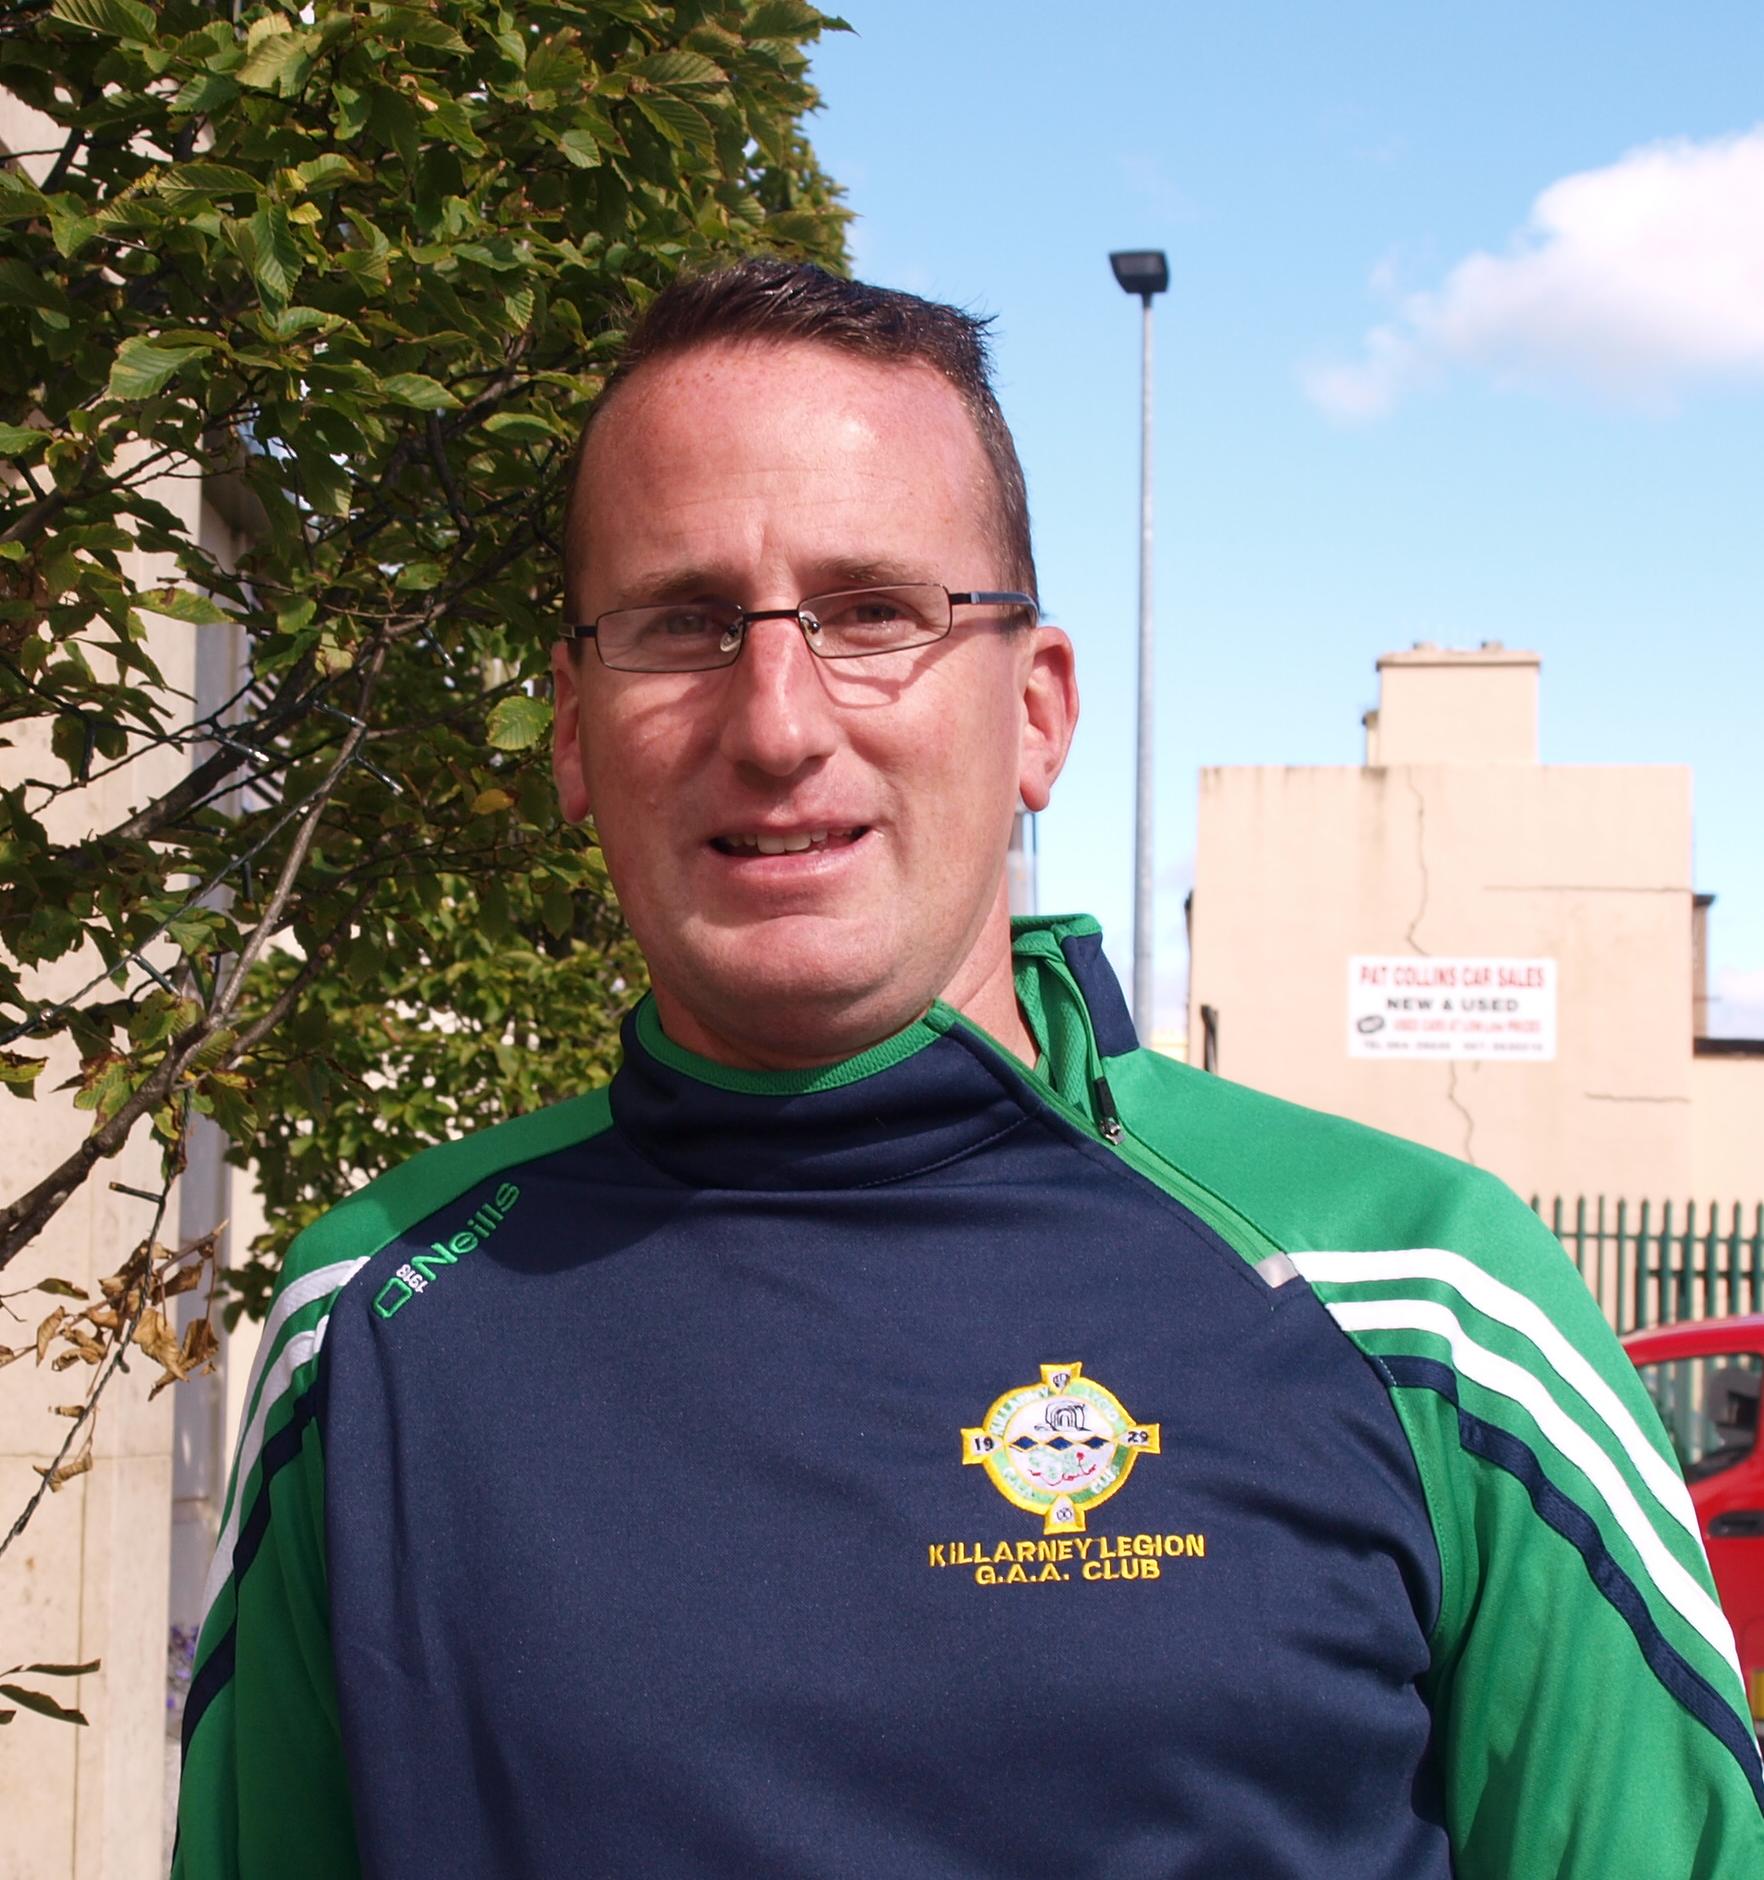 New Killarney Legion chairman Enda Walshe.